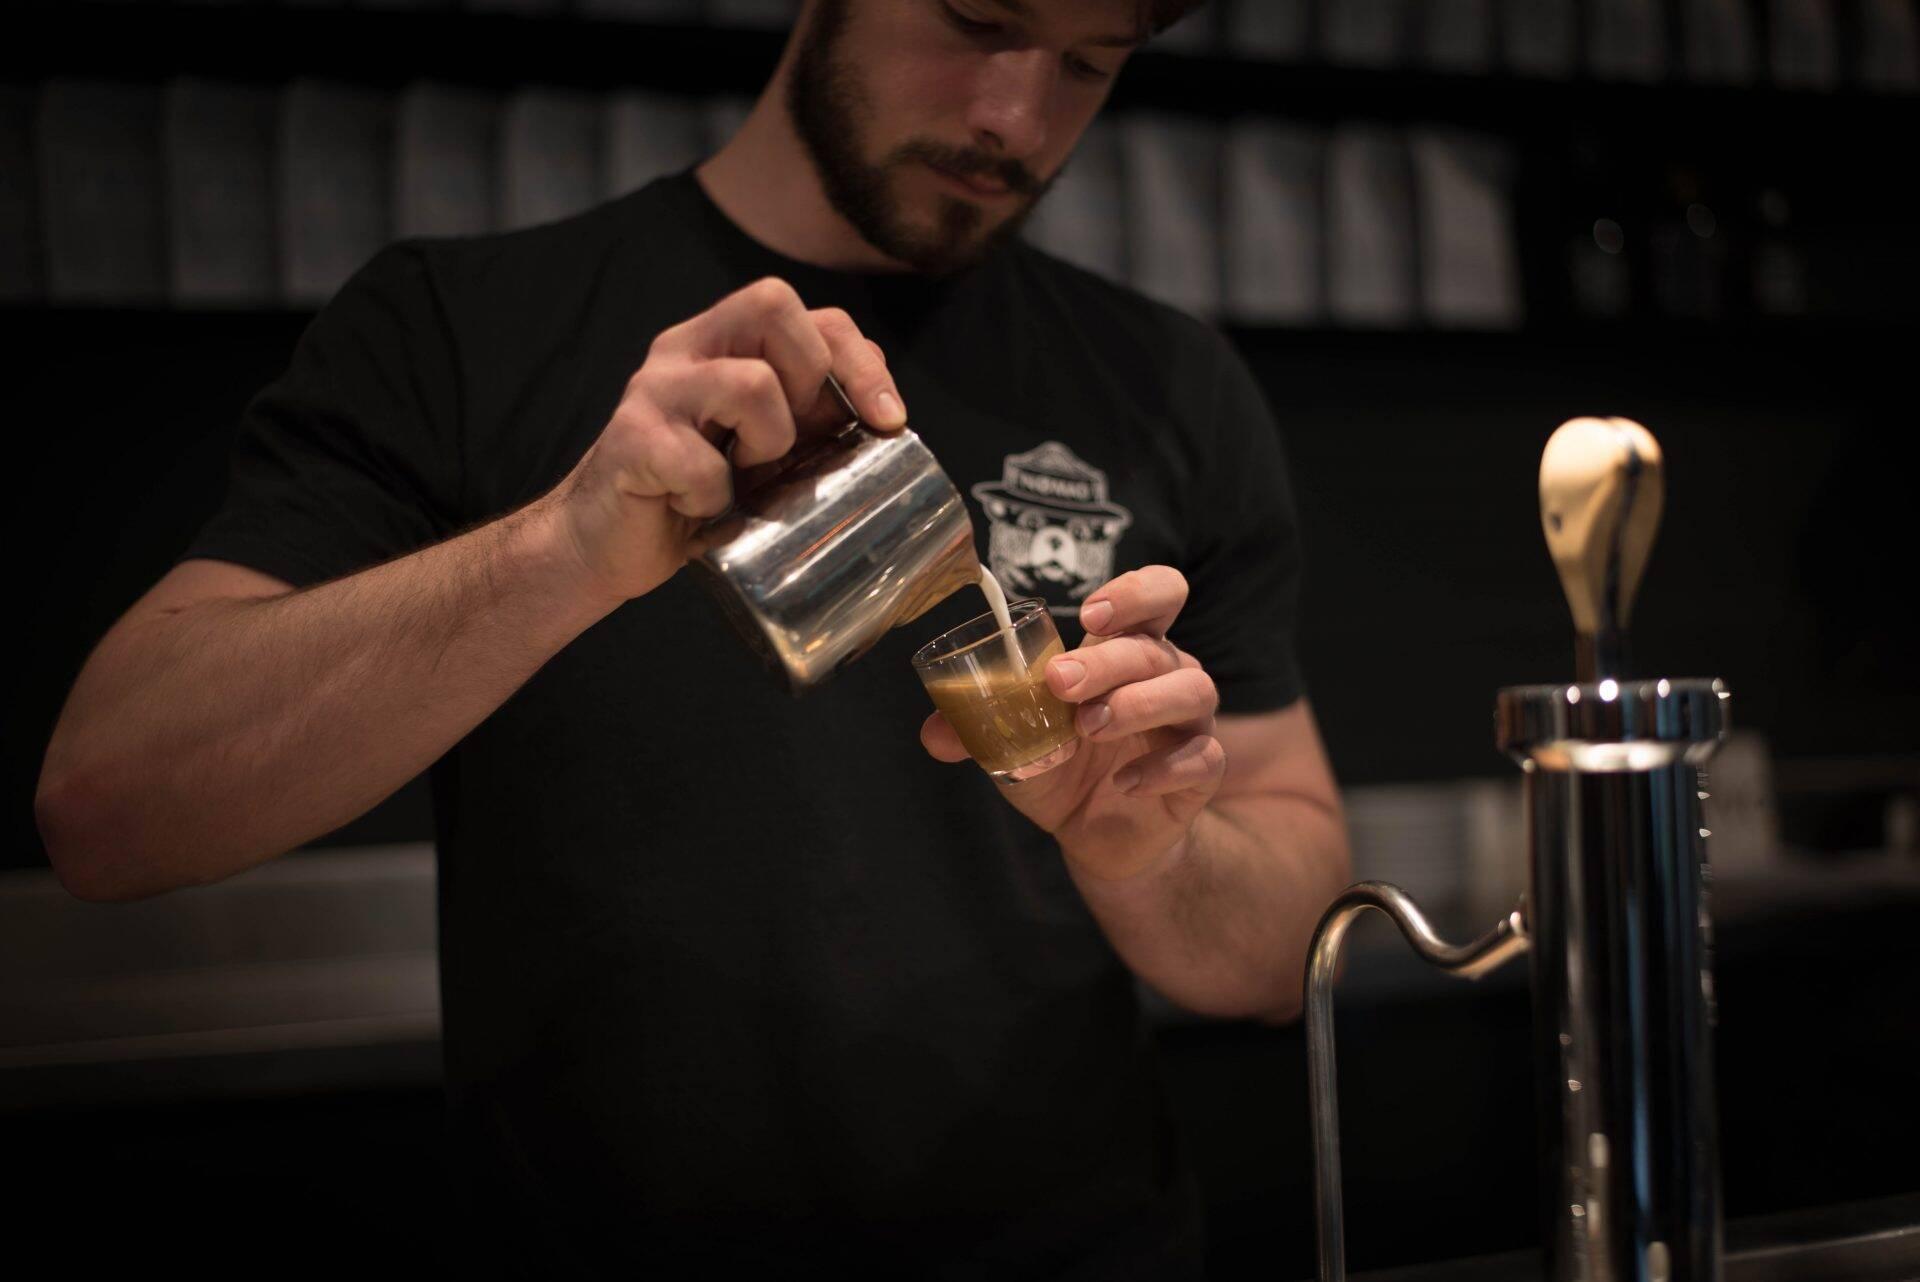 Nømad Coffee Lab & Shop in Barcelona